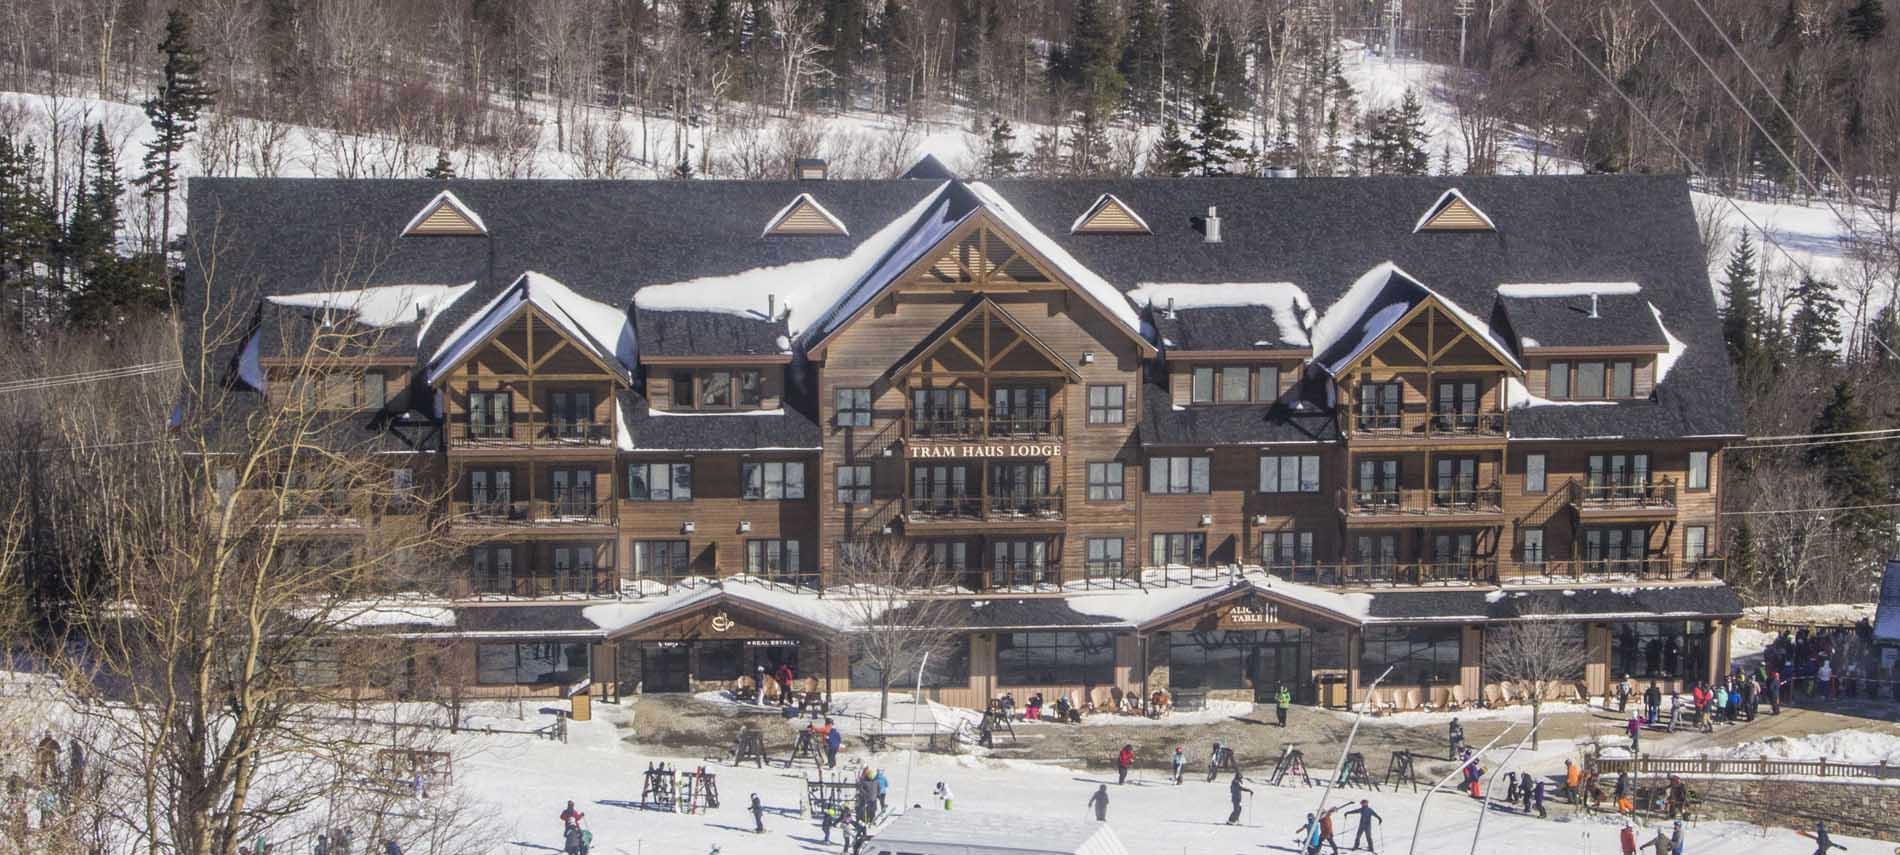 jay peak vermont ski resort base lodge busy with skiers